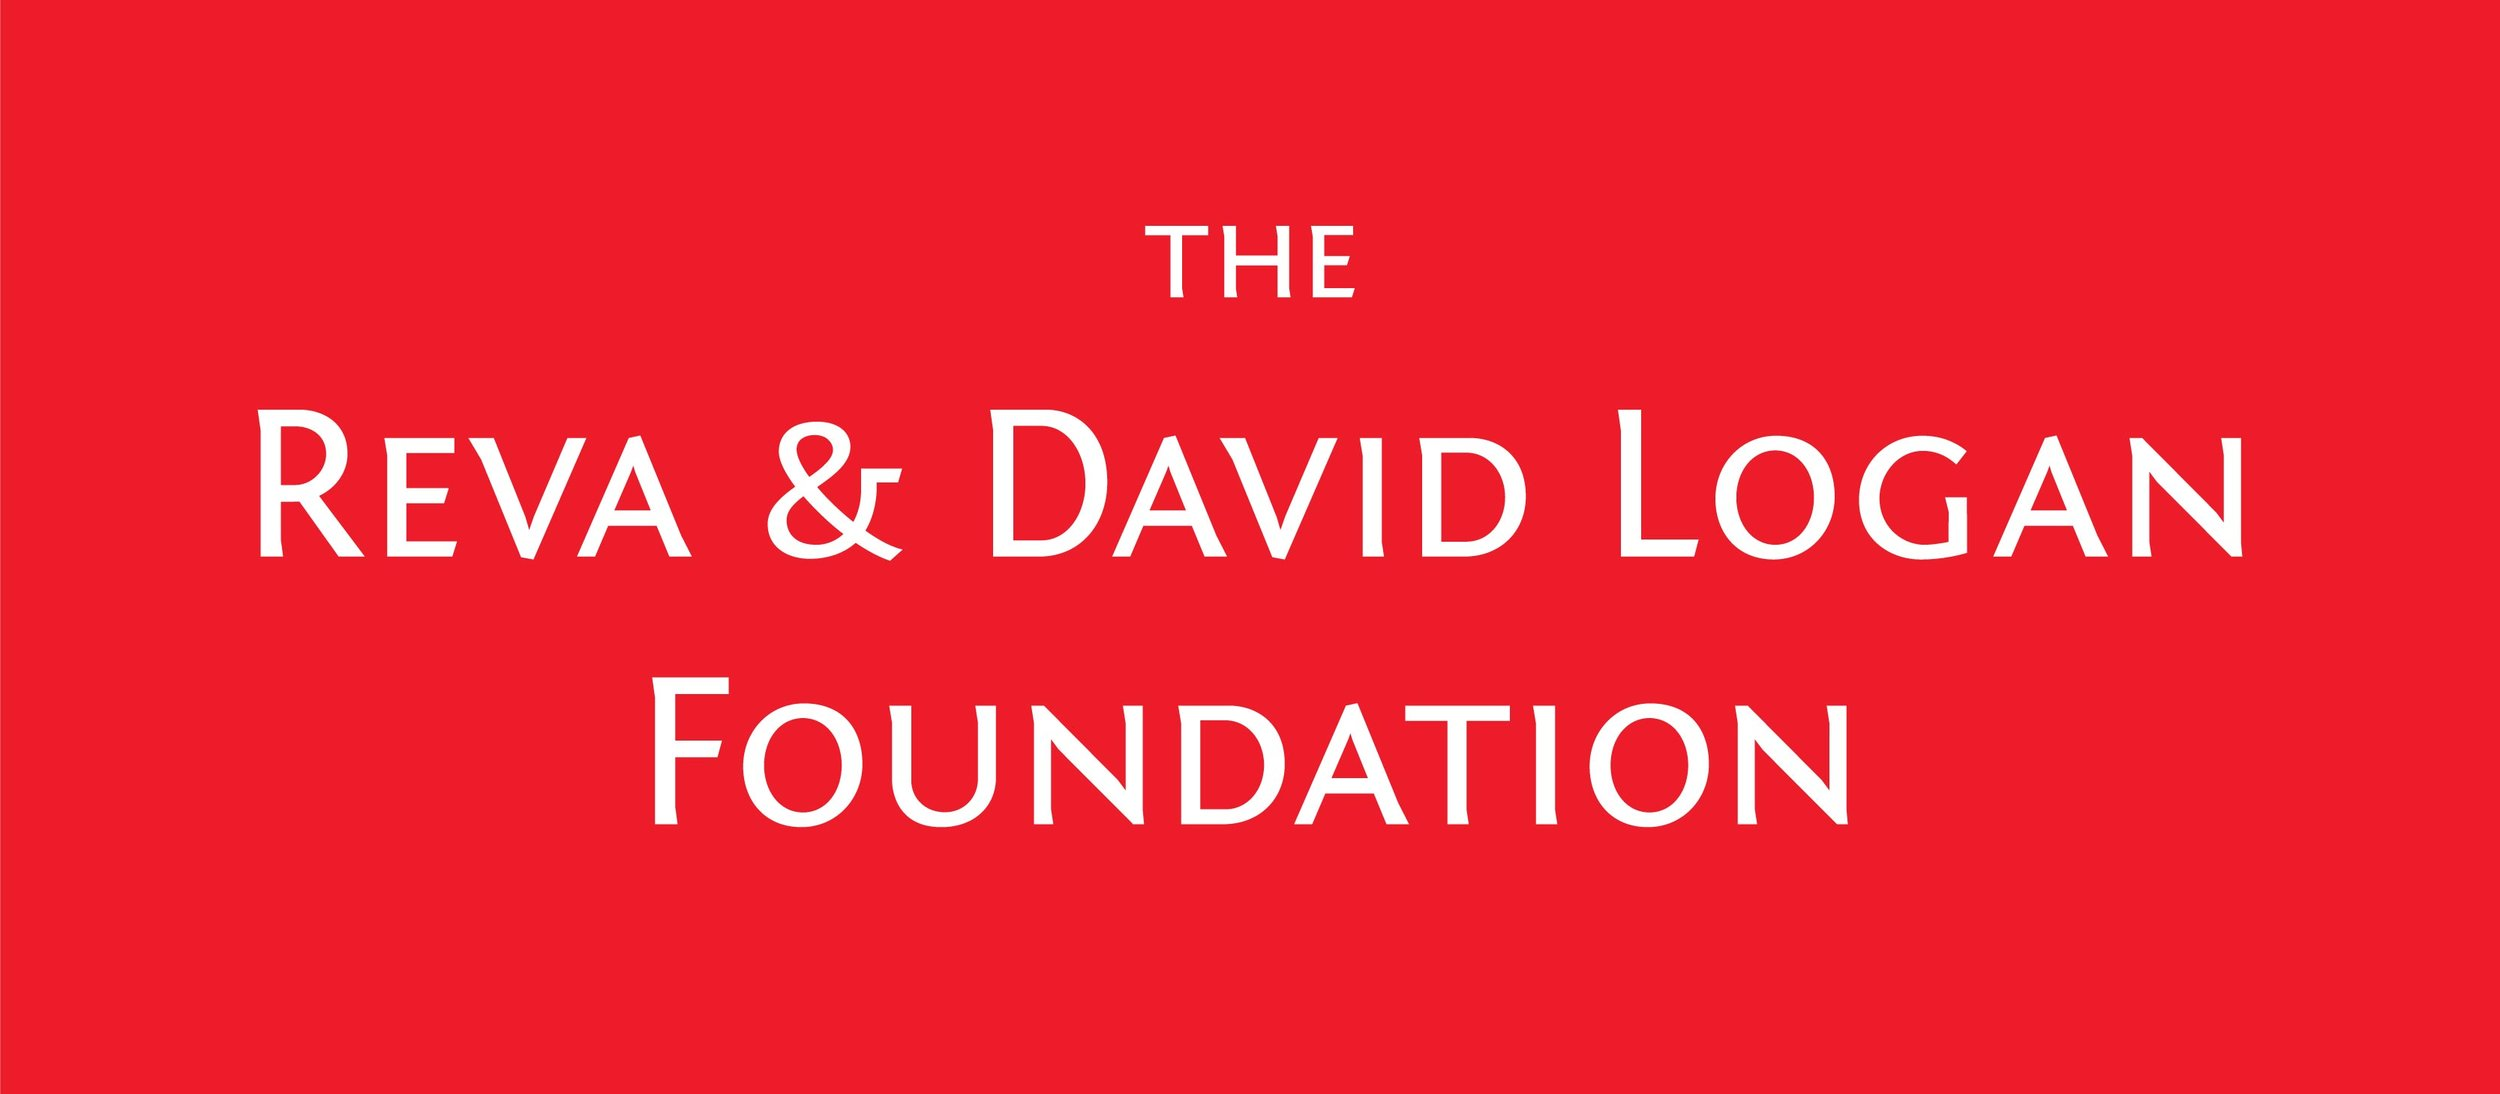 logan-foundation-logo_0.jpg